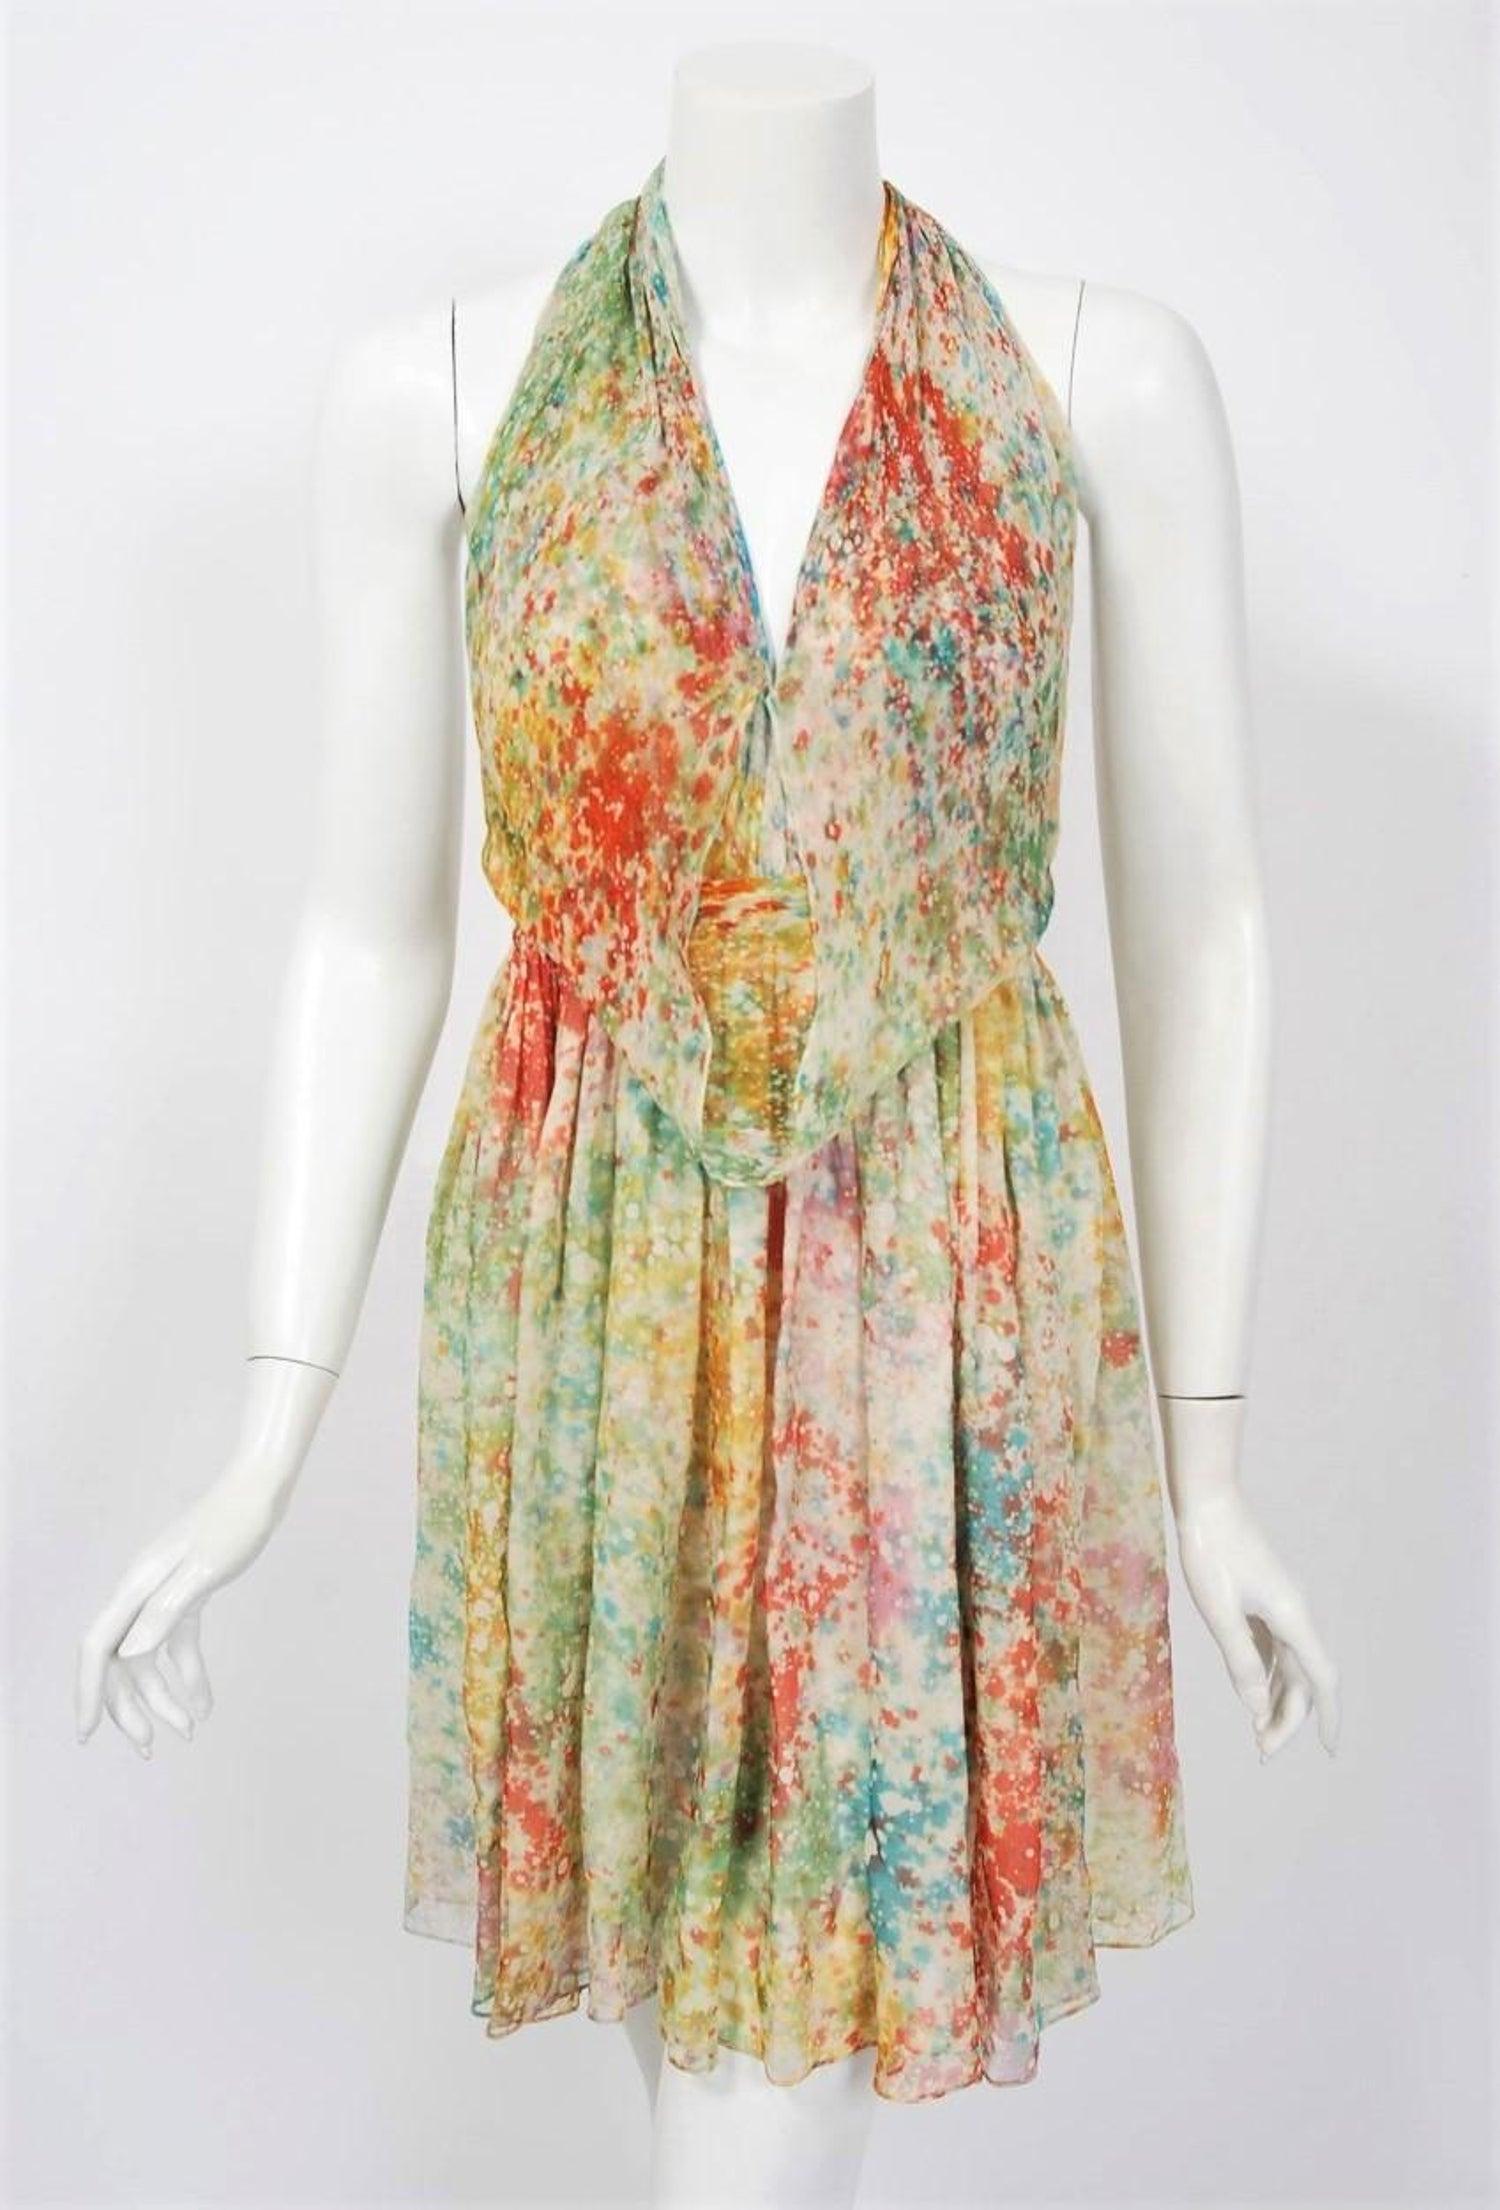 1db0fec3e9 1975 Halston Couture Watercolor Print Silk Backless Draped Halter Mini Dress  For Sale at 1stdibs